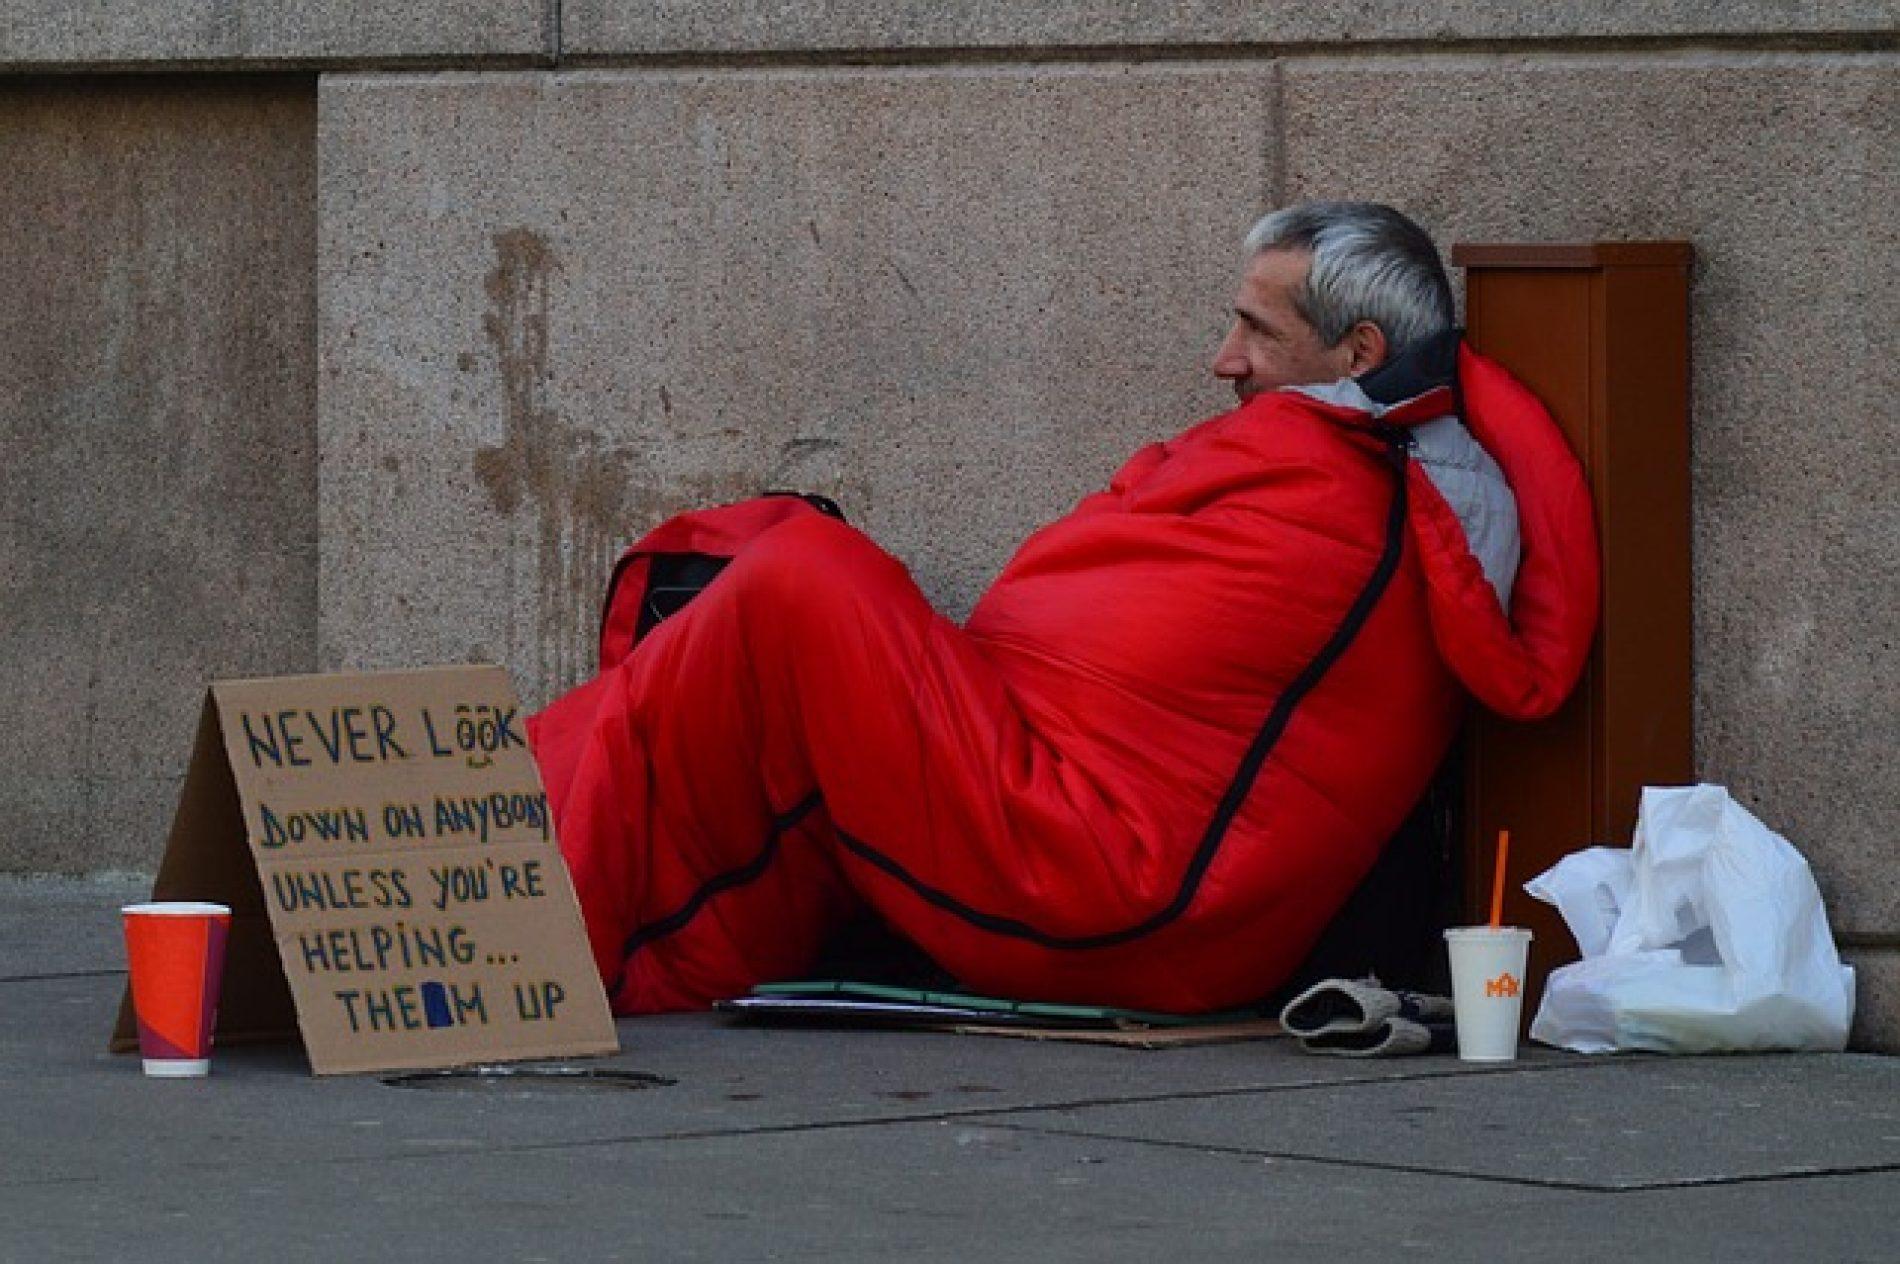 Better Bankside Together At Christmas Campaign